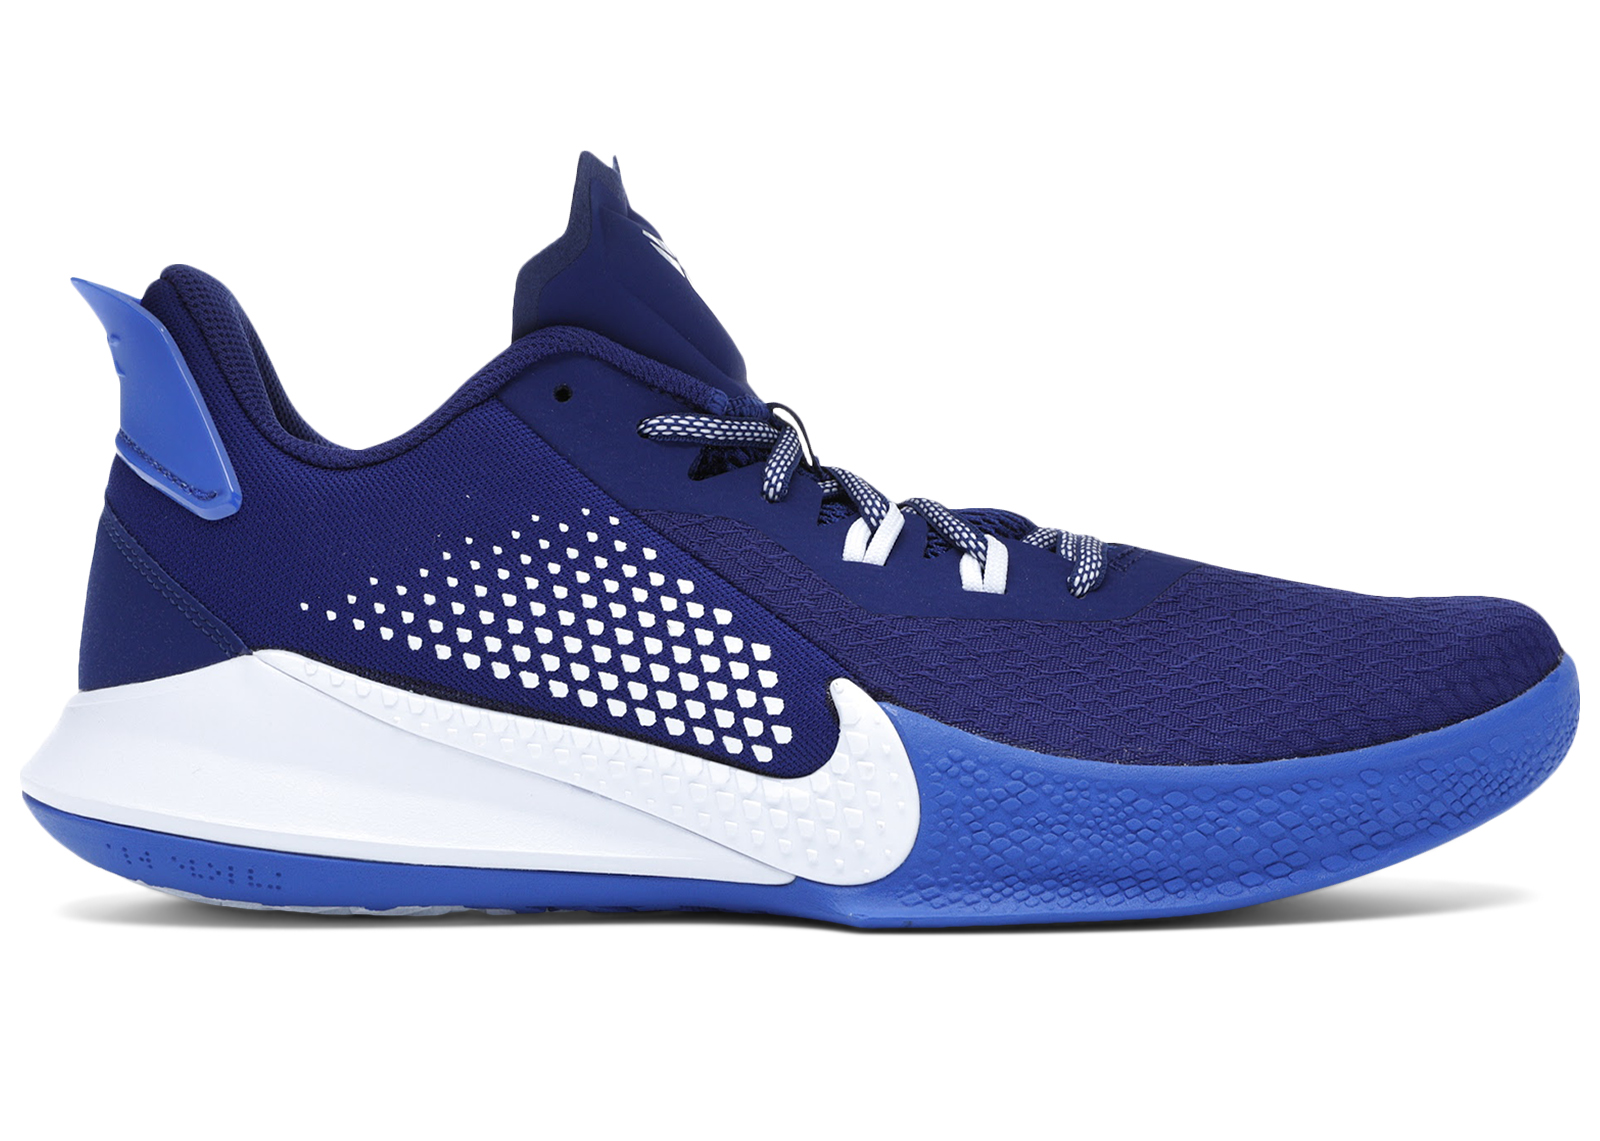 Nike Mamba Fury Deep Royal Blue (Team)